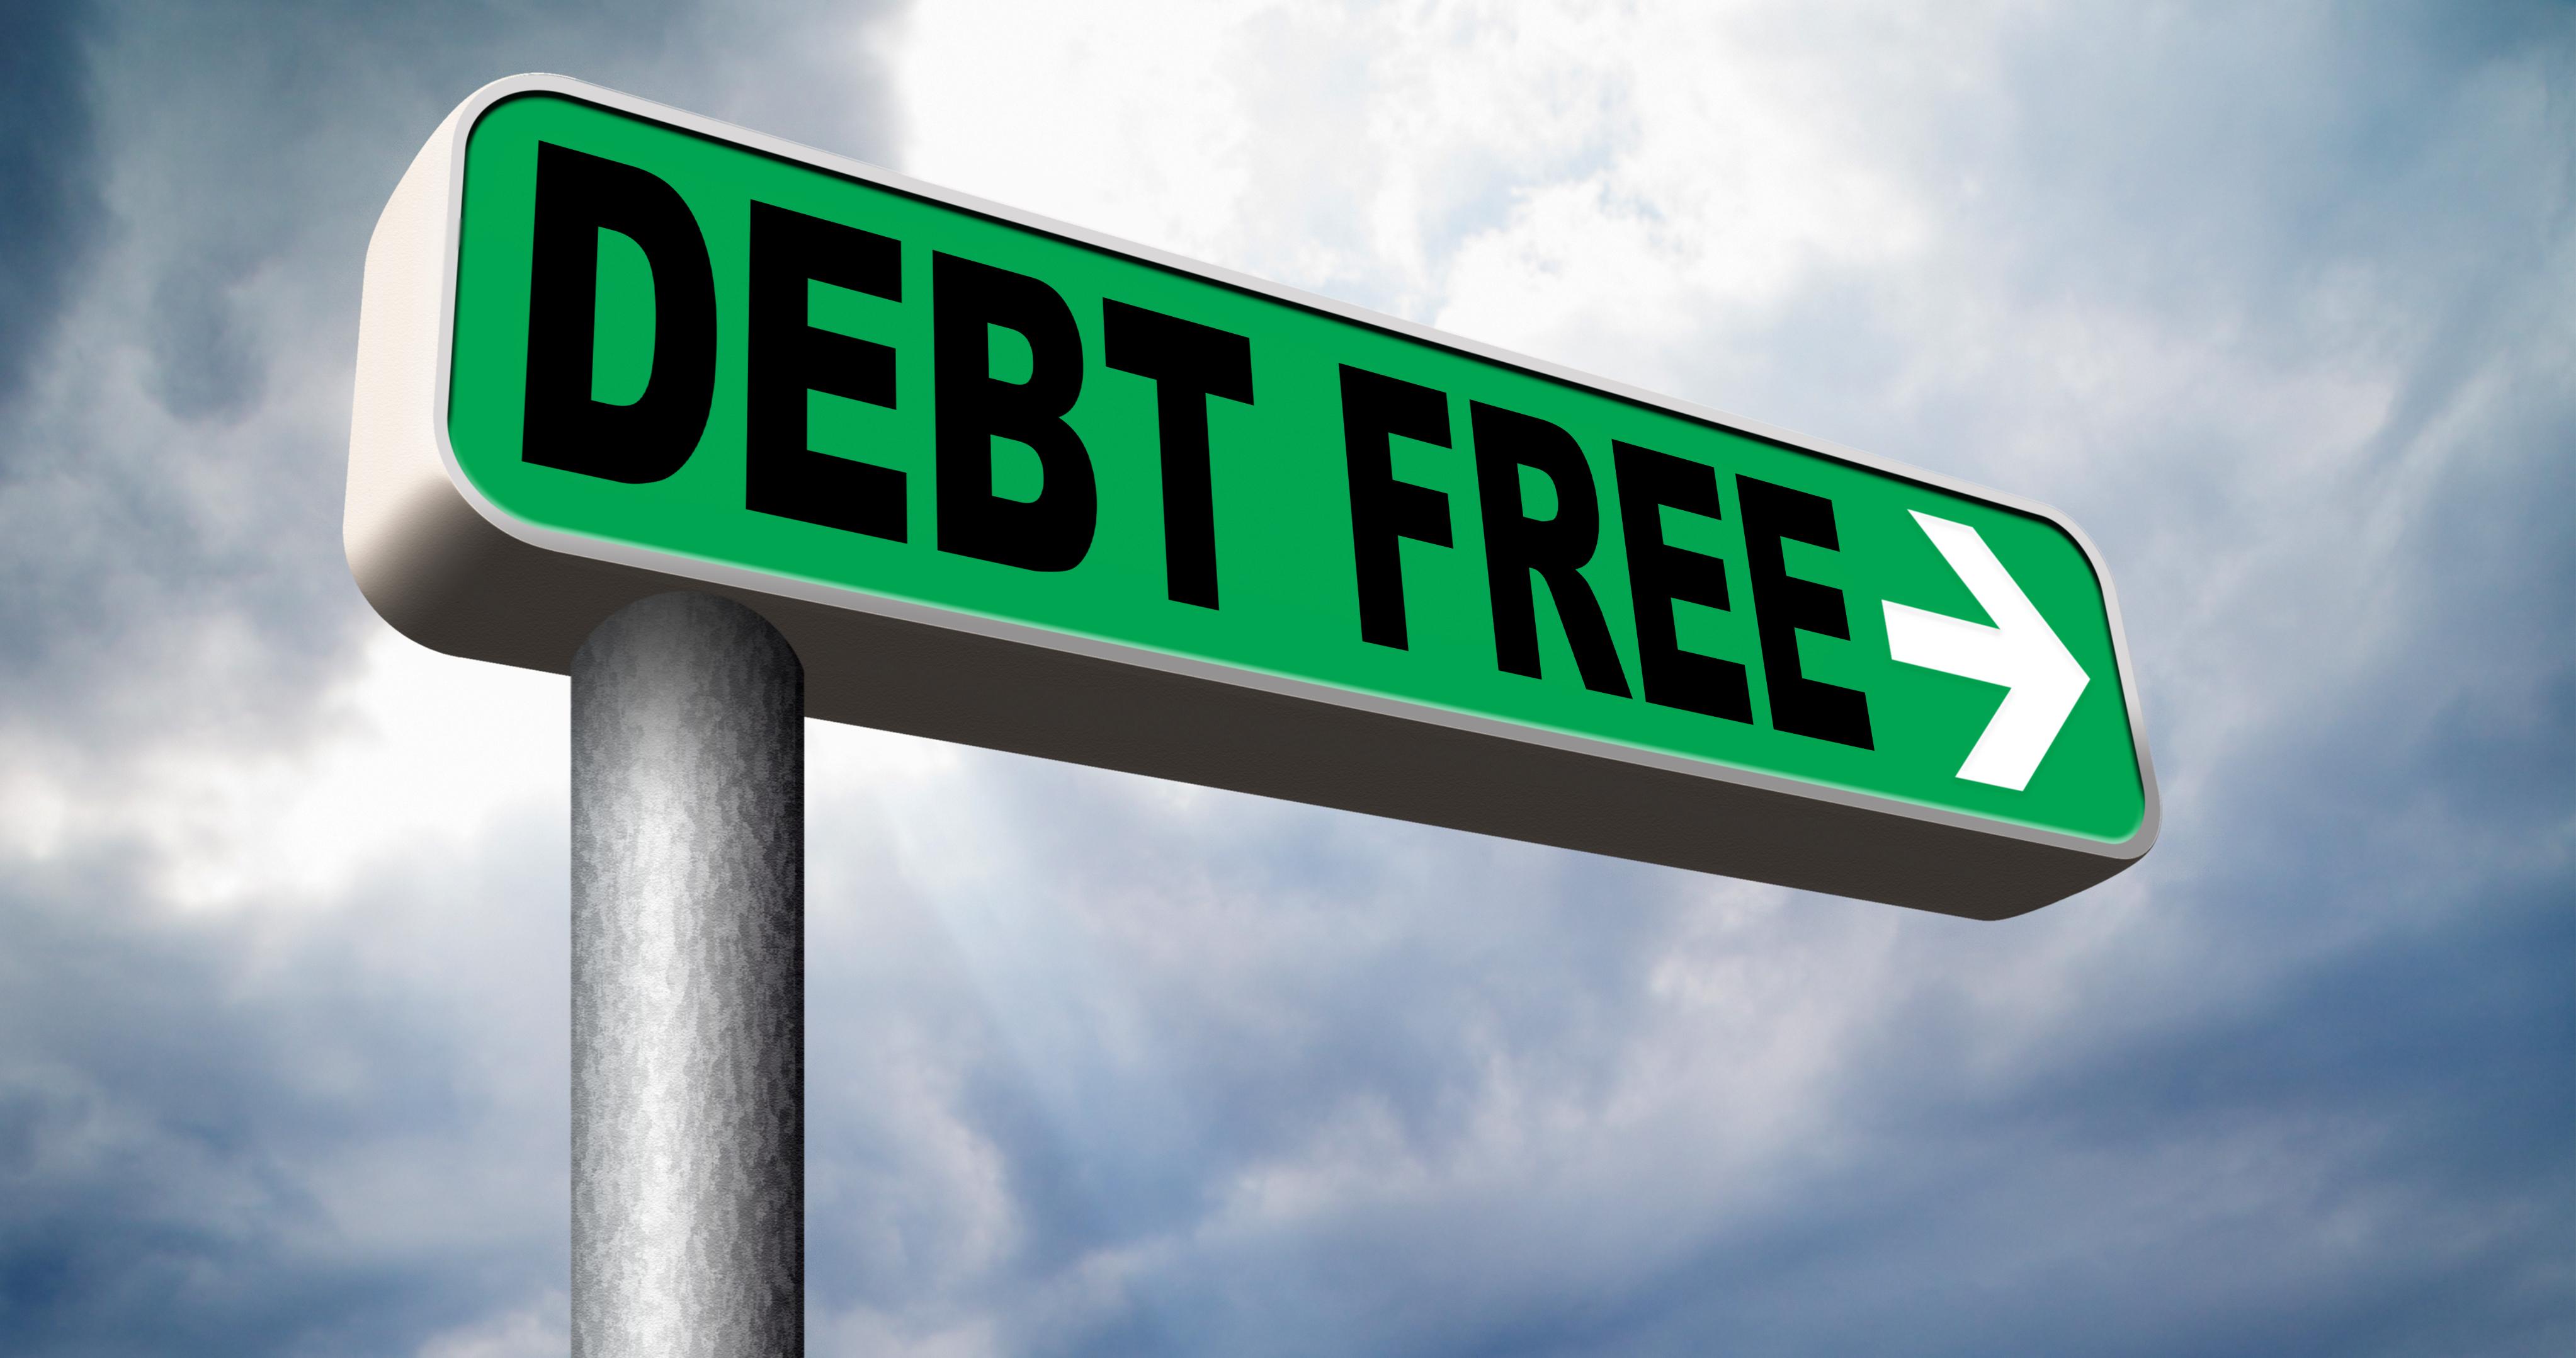 Debt free signages